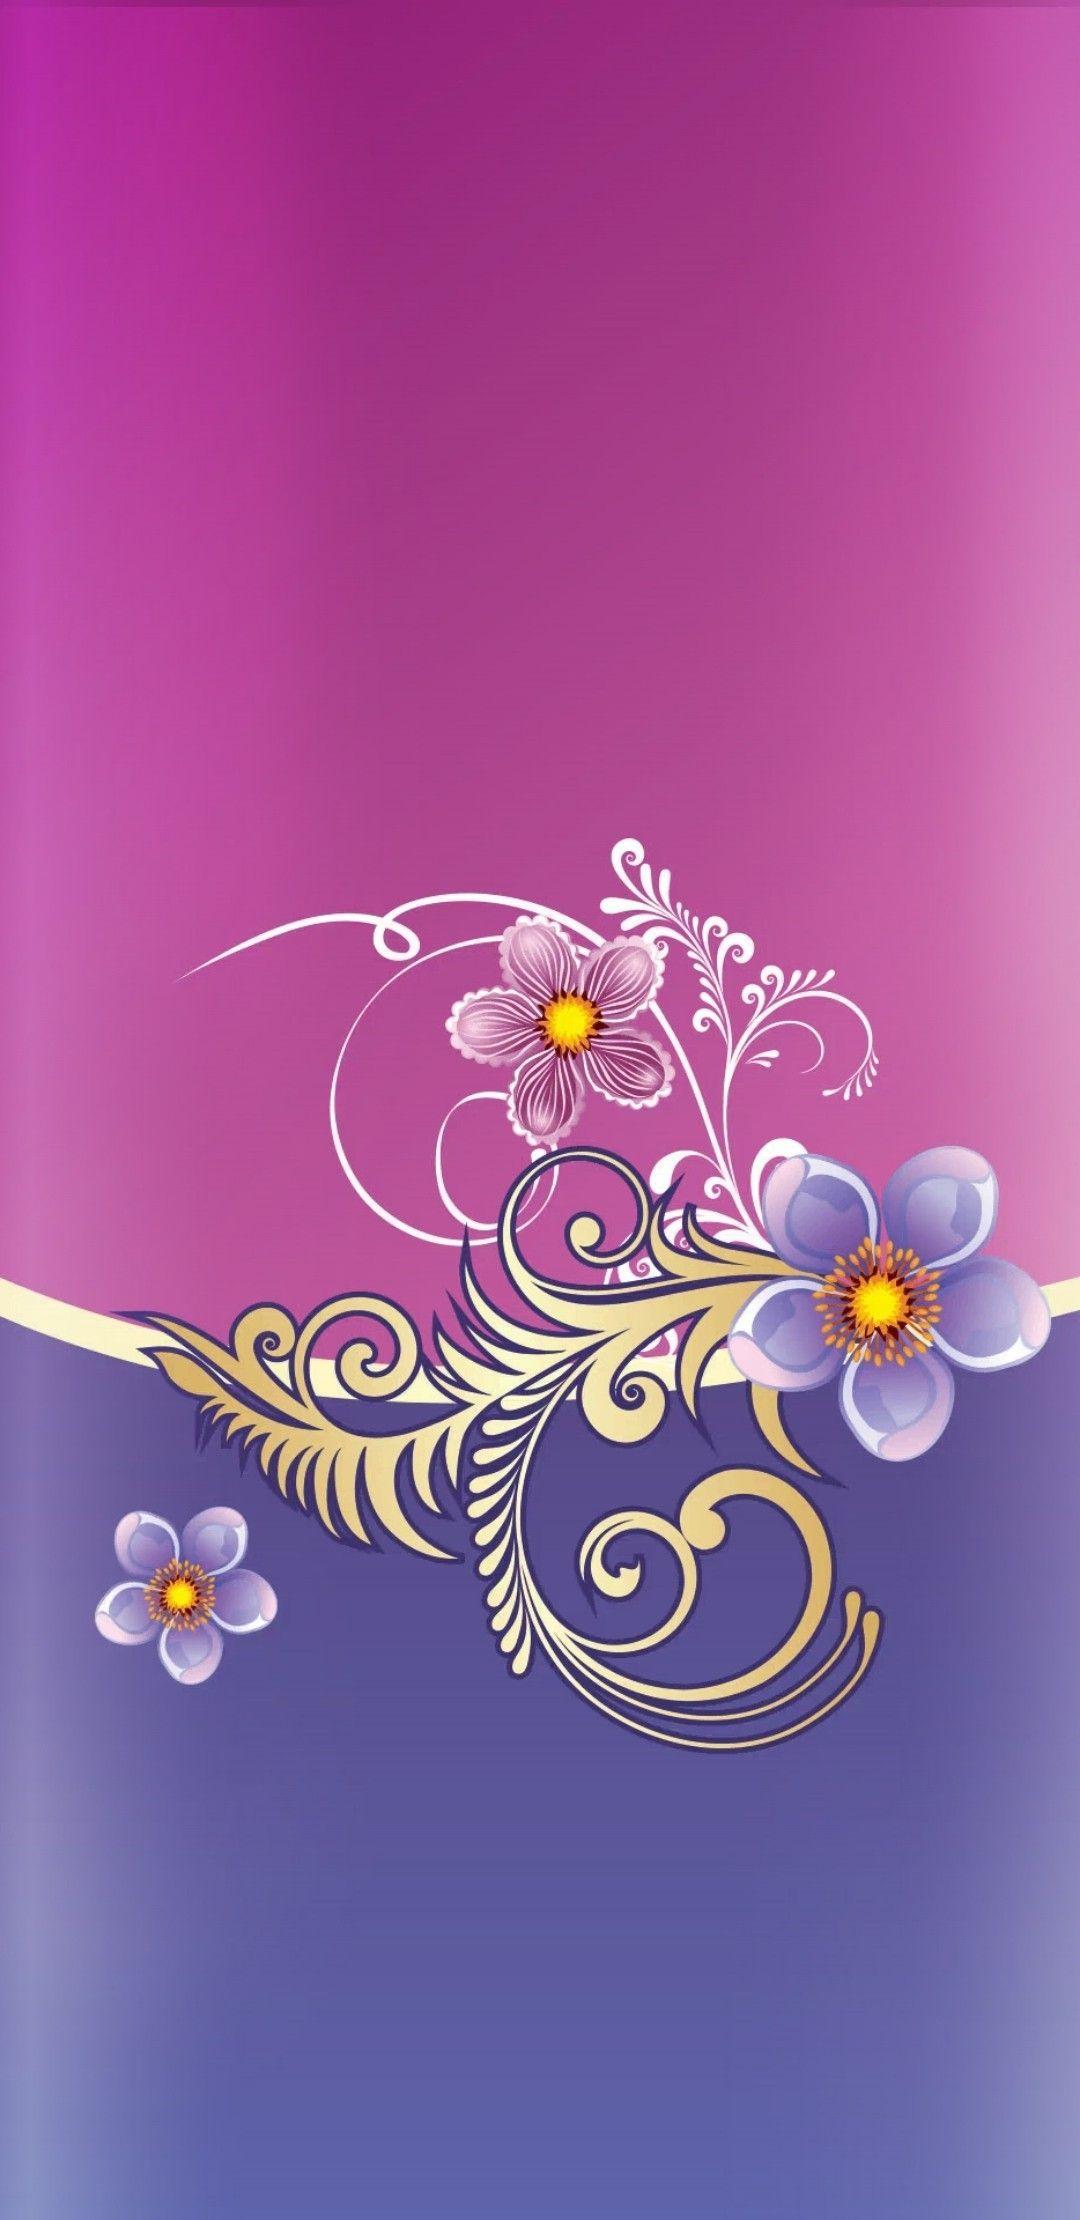 Pin by Mavra Ua on Фоновые изображения Pretty wallpapers